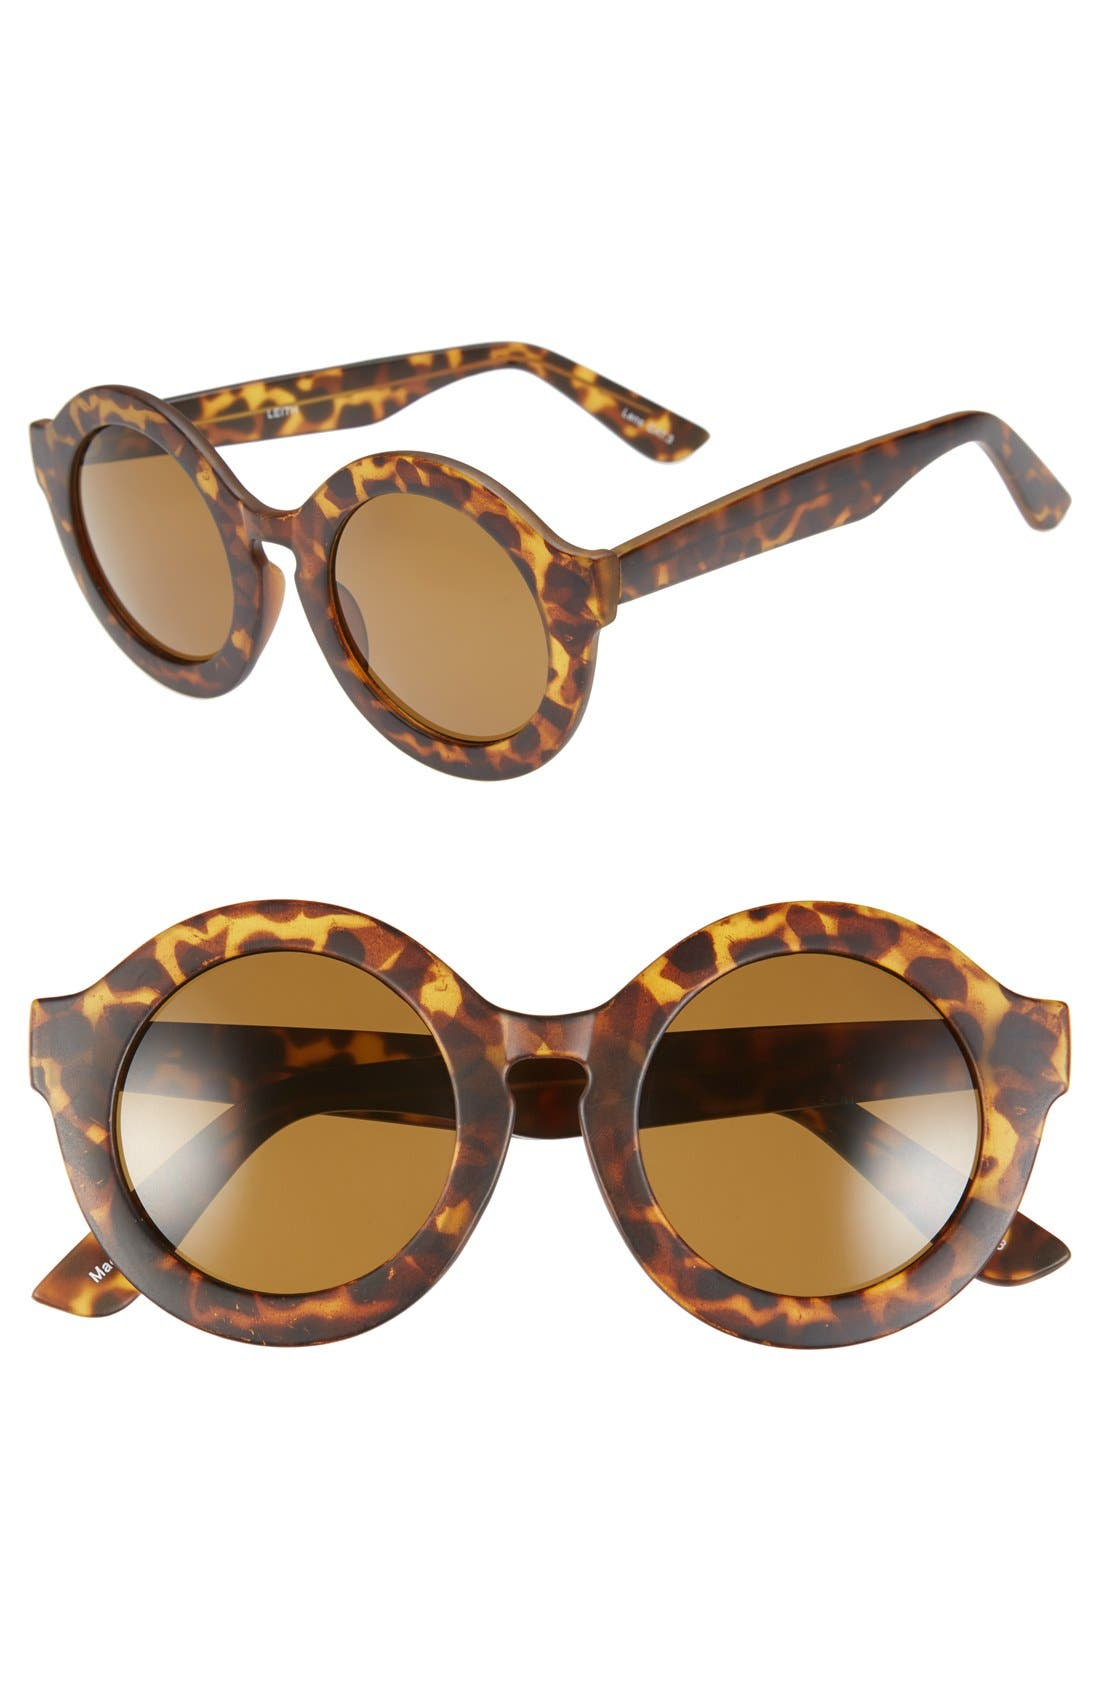 Main Image - Leith 'Penelope' Tortoise' Round Sunglasses